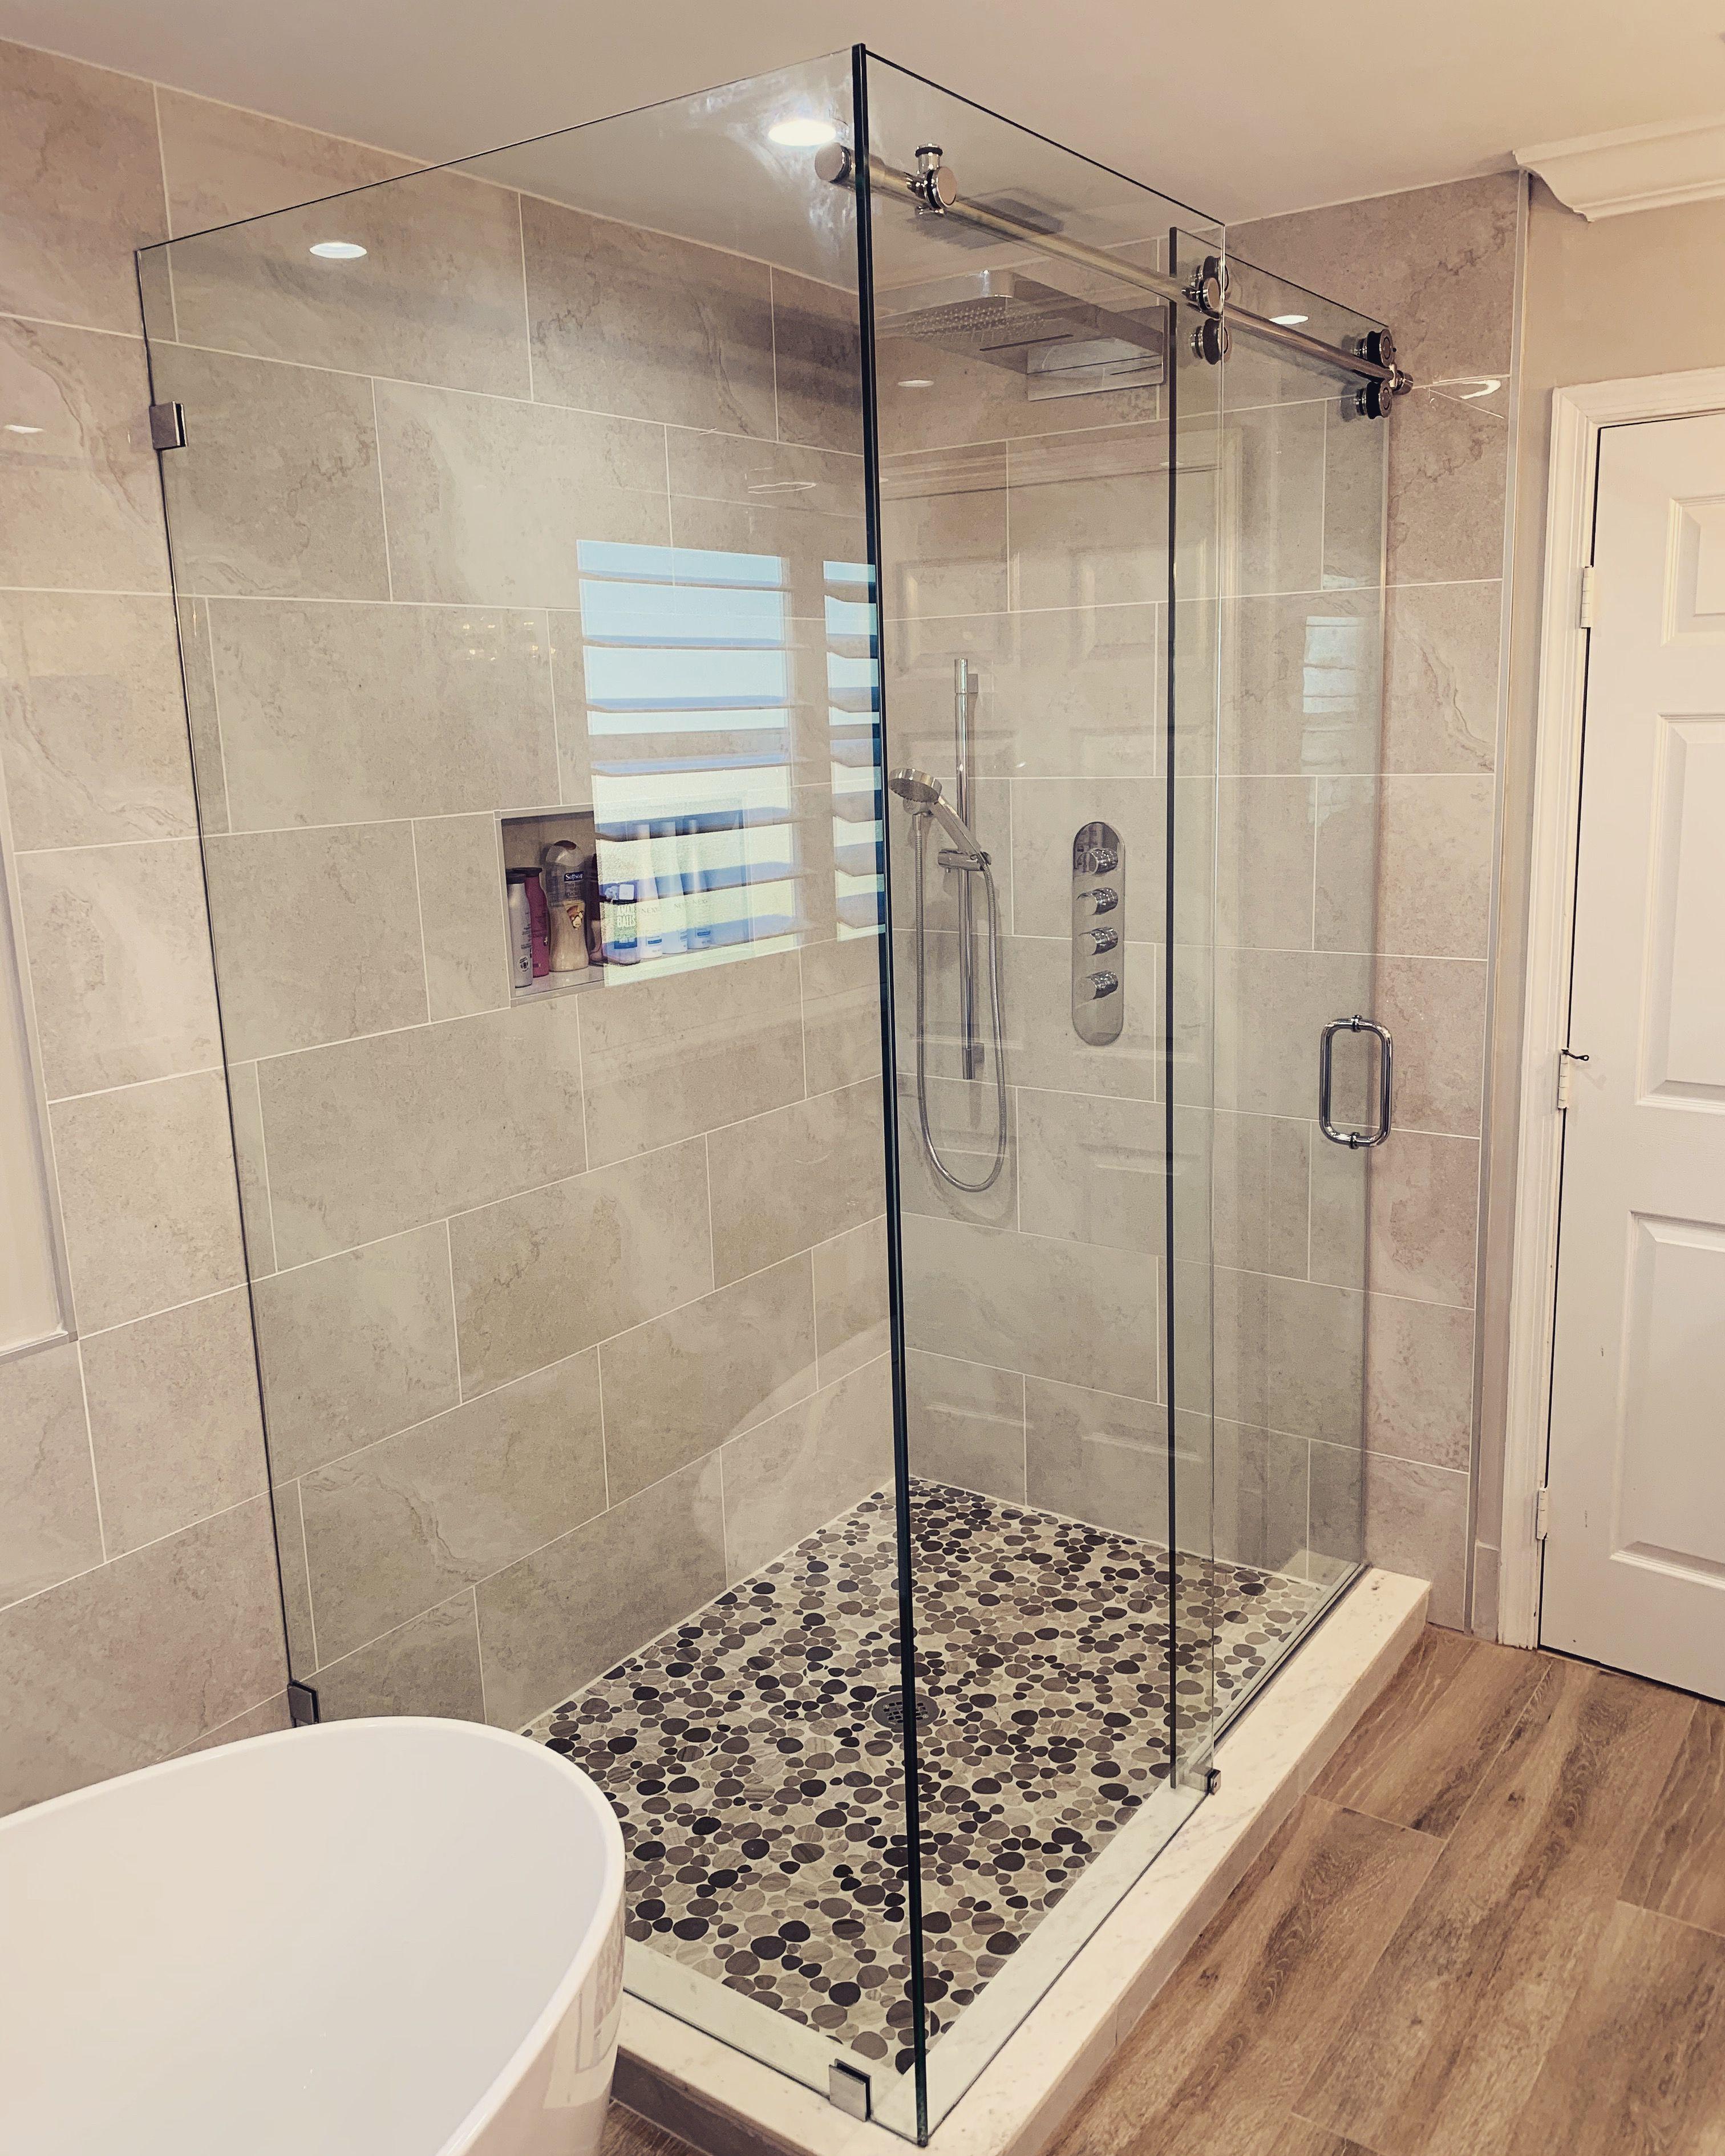 Quatro System One Sliding Door Bathroomdecor Bathroomremodel